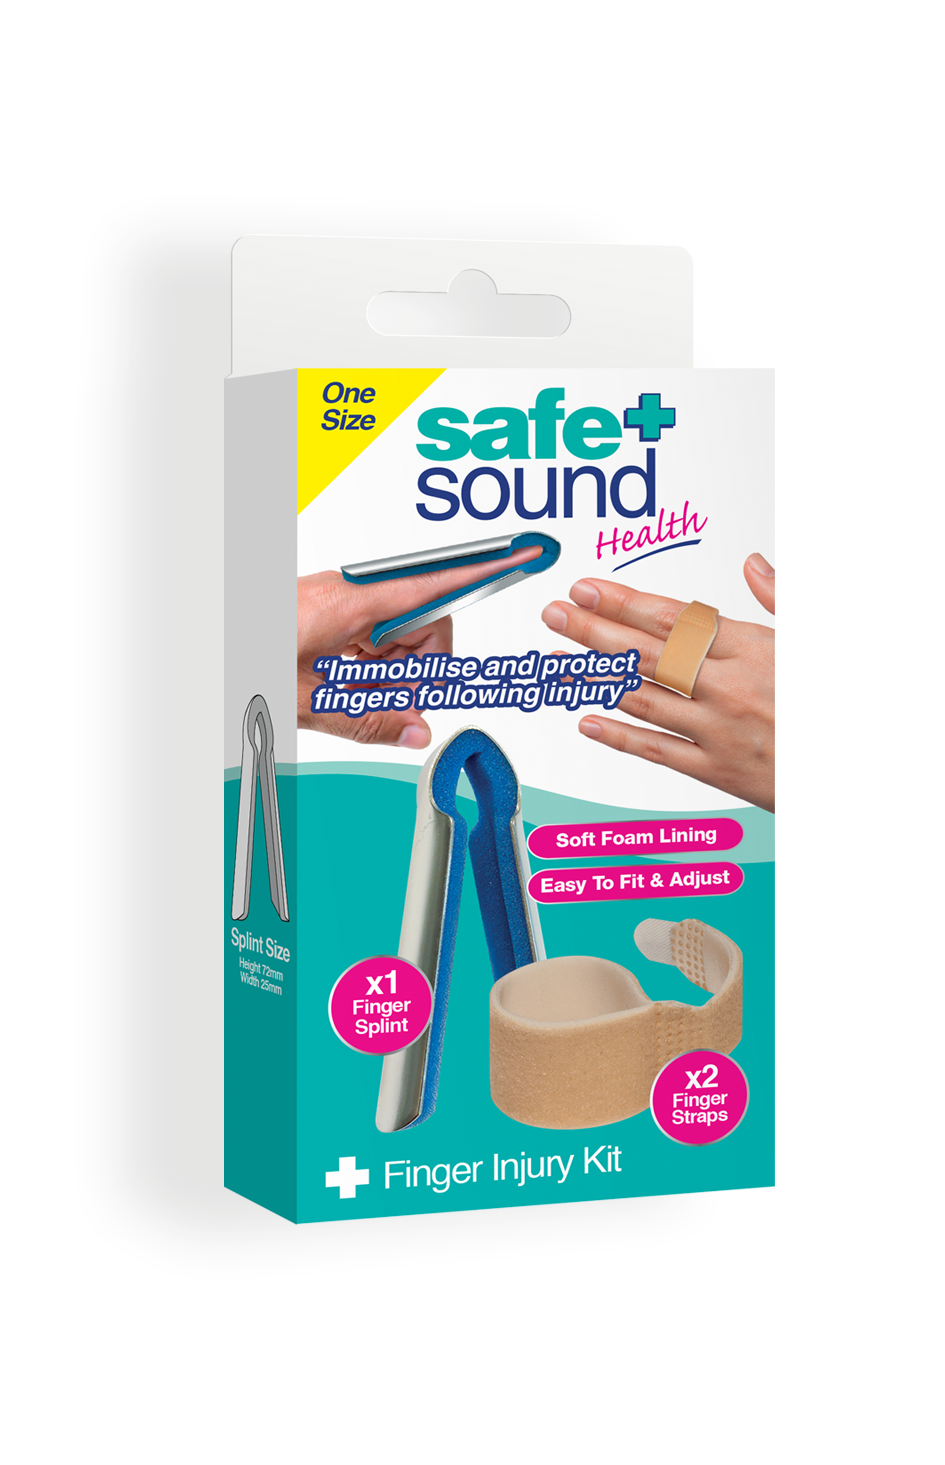 Safe and Sound Health's Finger injury kit